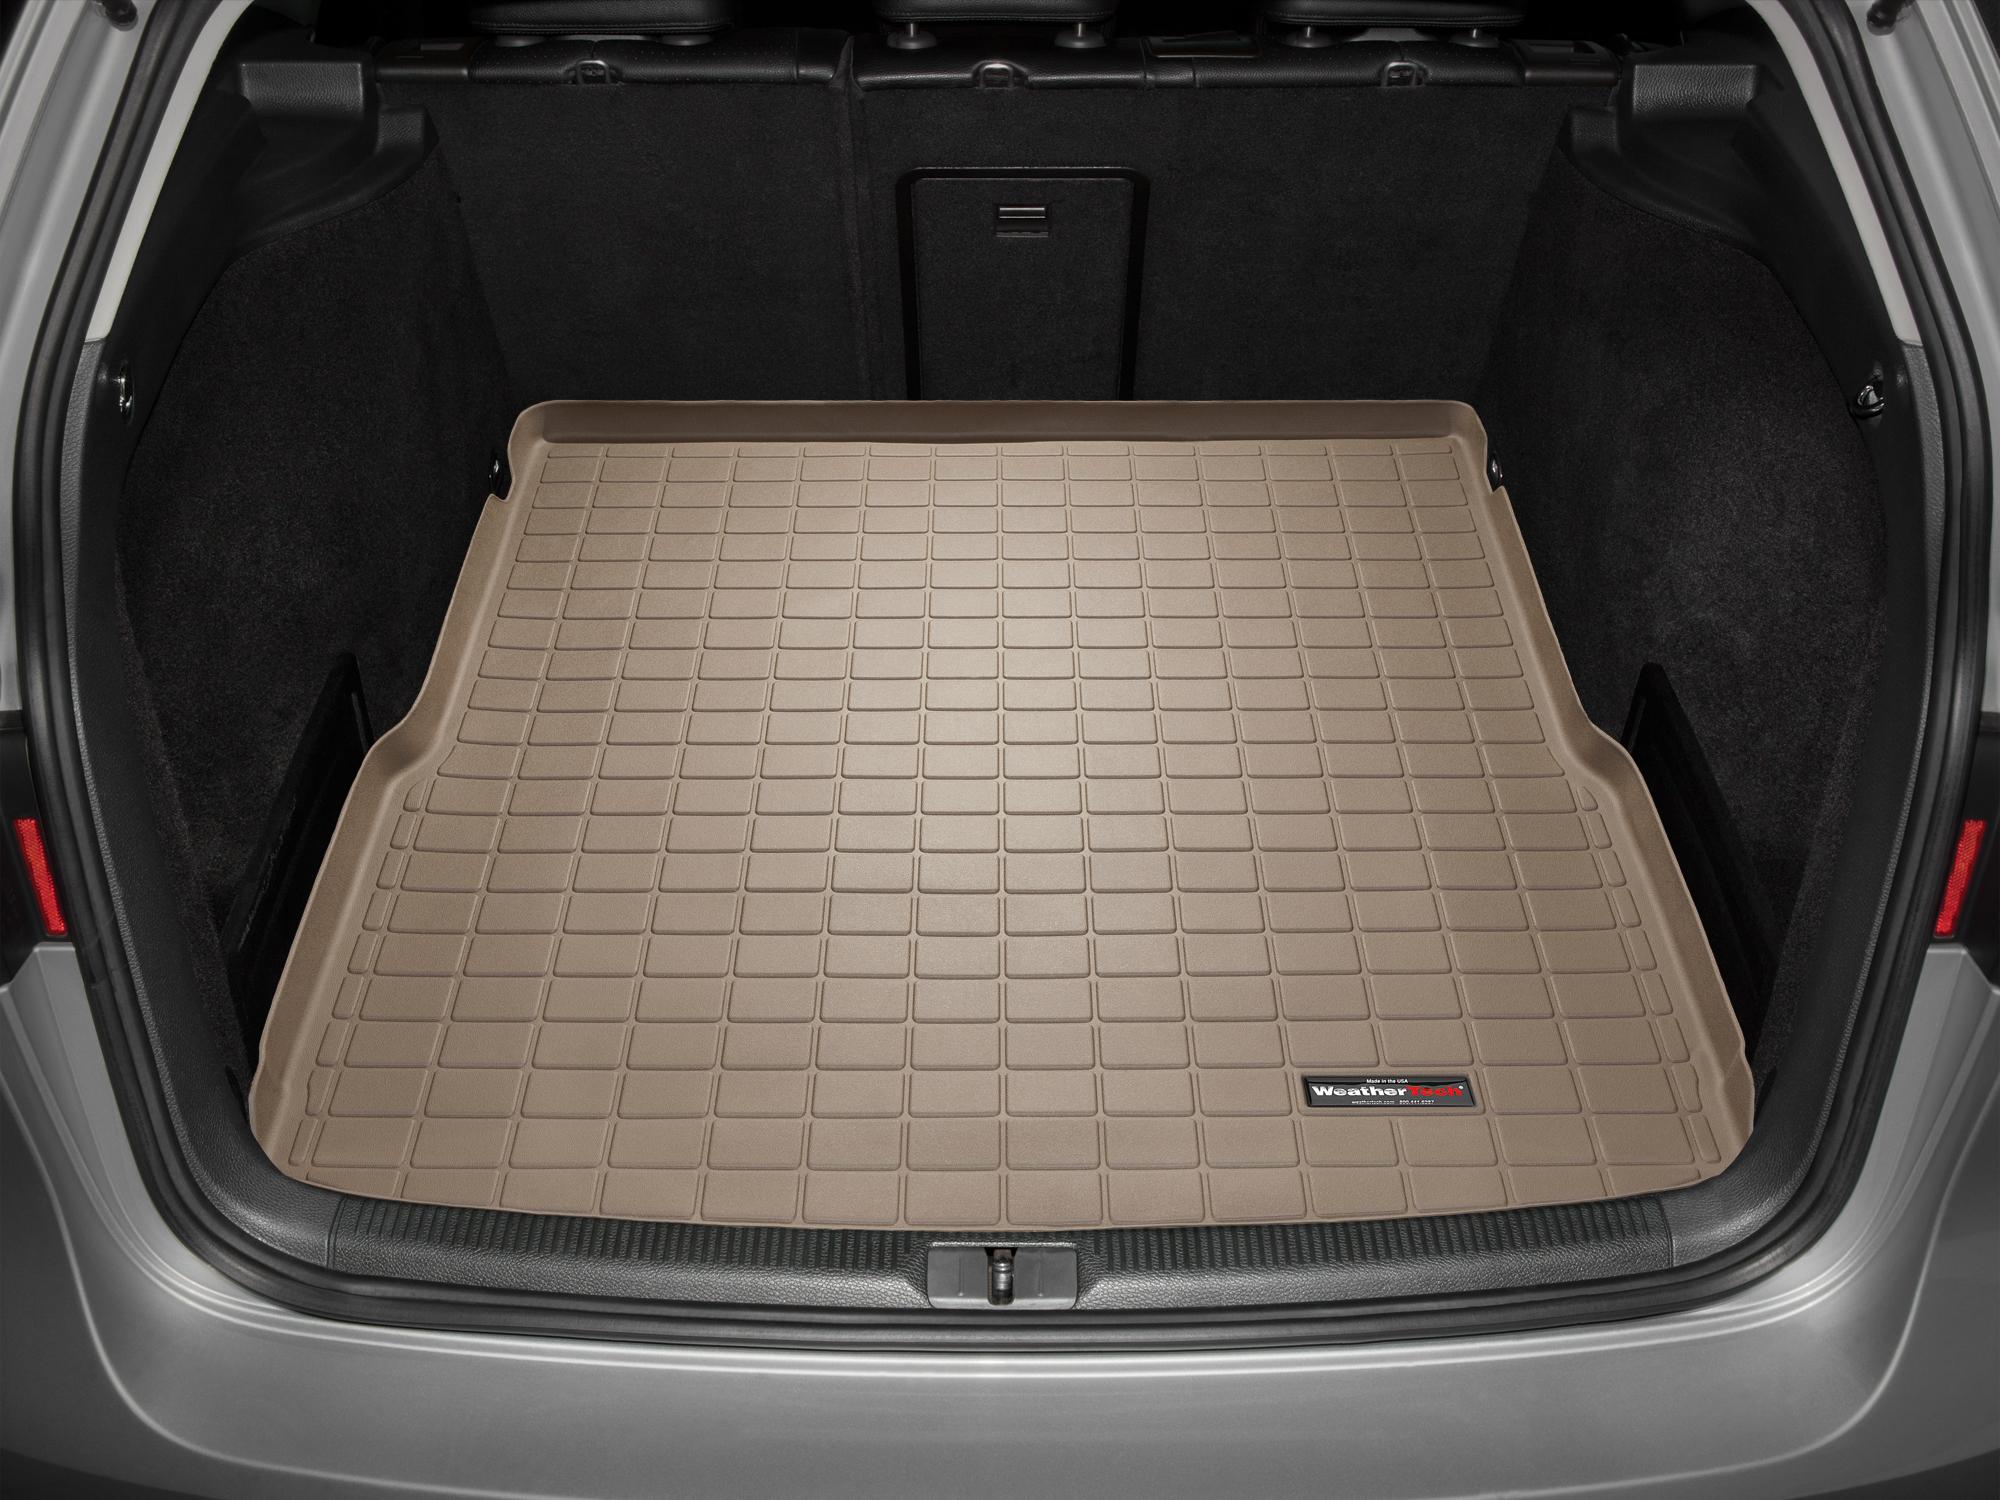 Volkswagen Passat 2006>2013 Vasca baule tappeto bagagliaio nero *1403